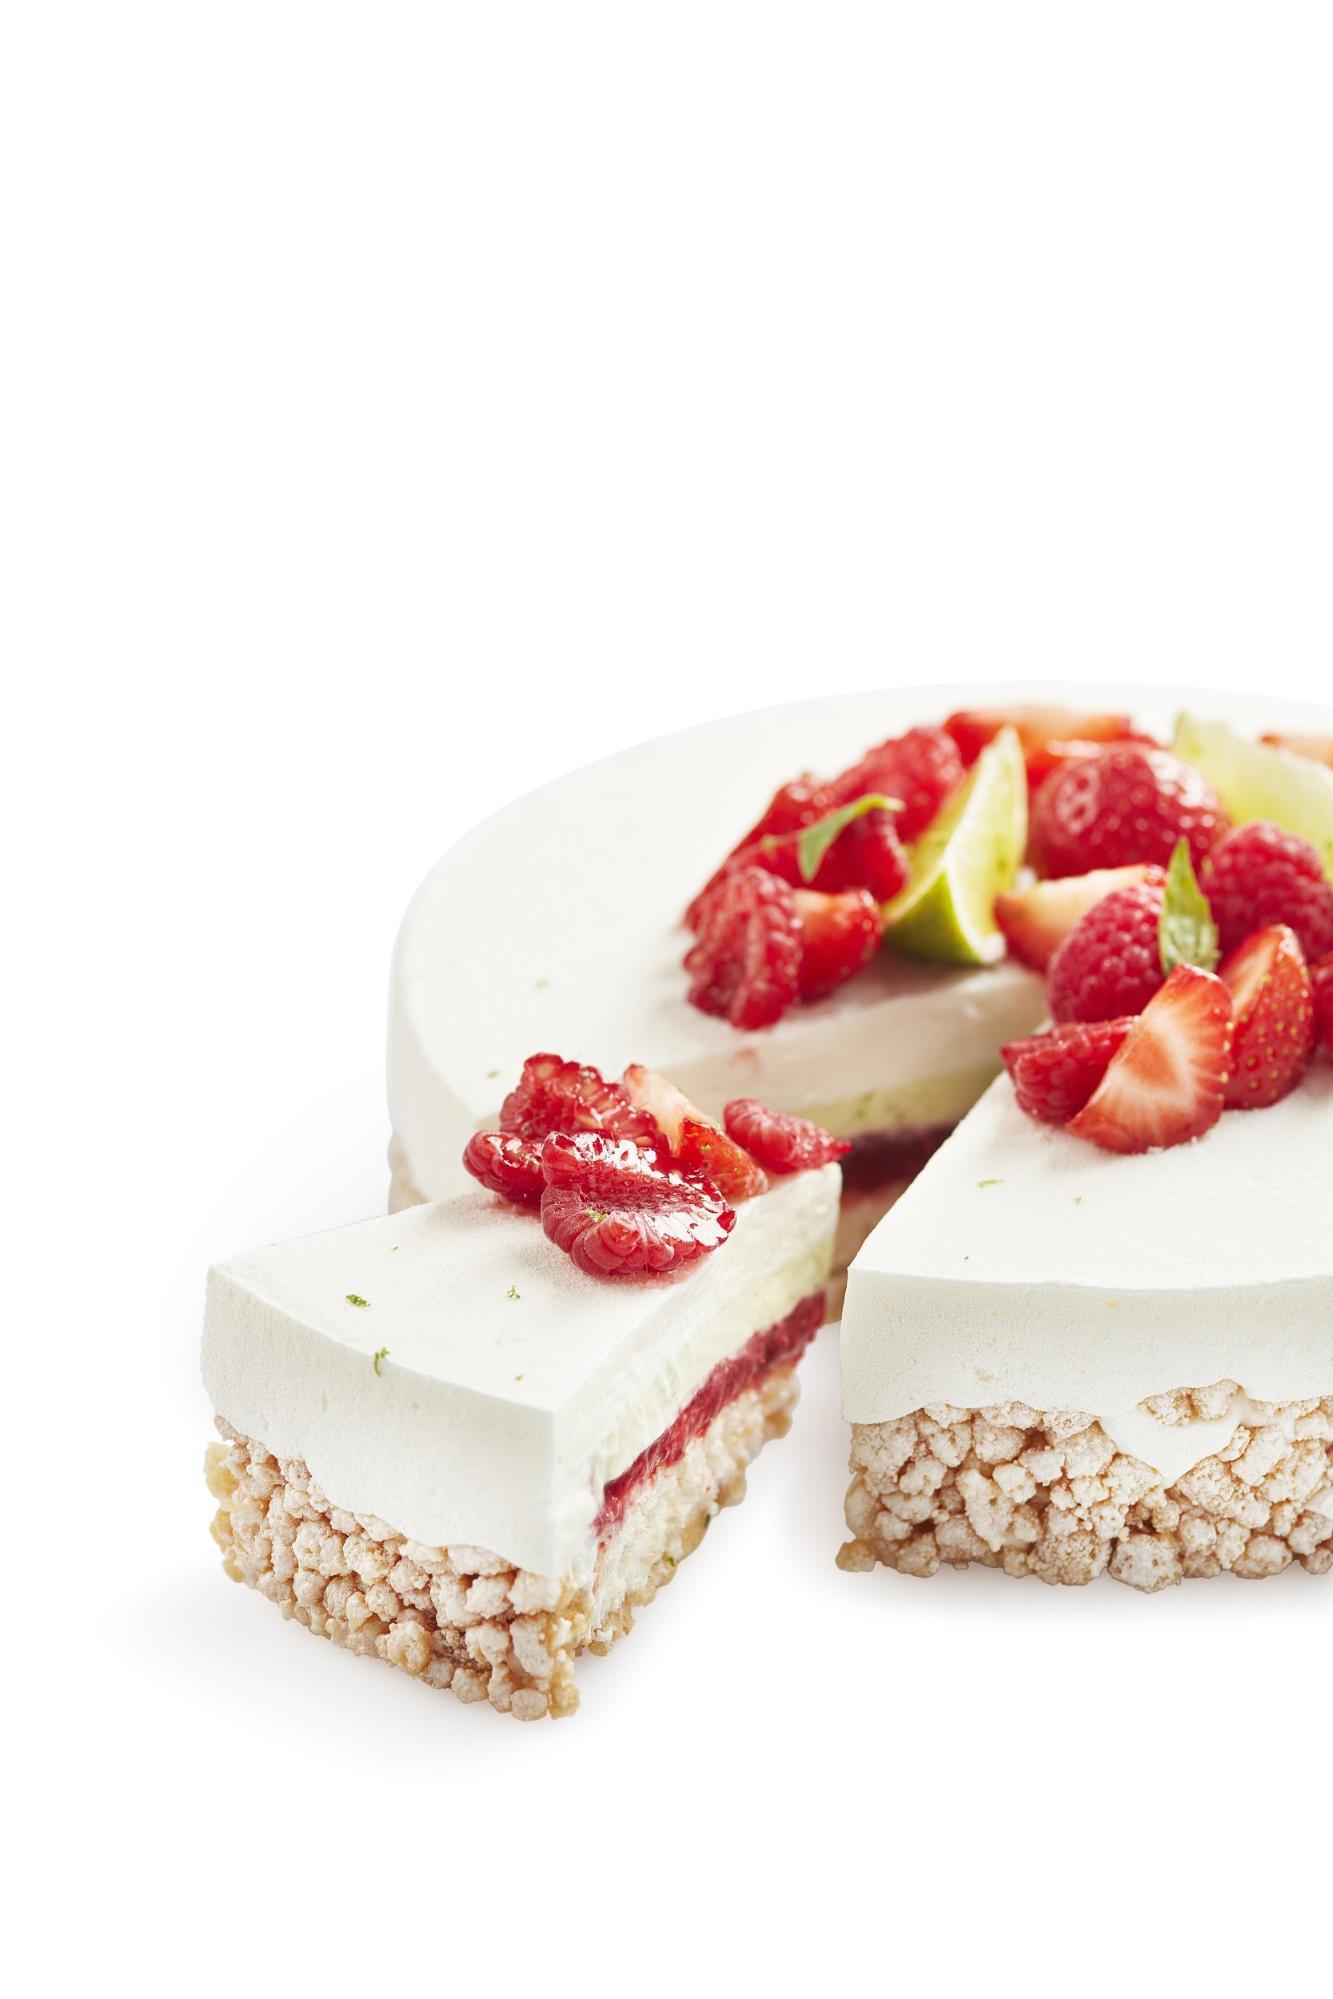 Cheesecake obra de Jordi Bordas, pastelero de Barcelona e inventor del método B Concept